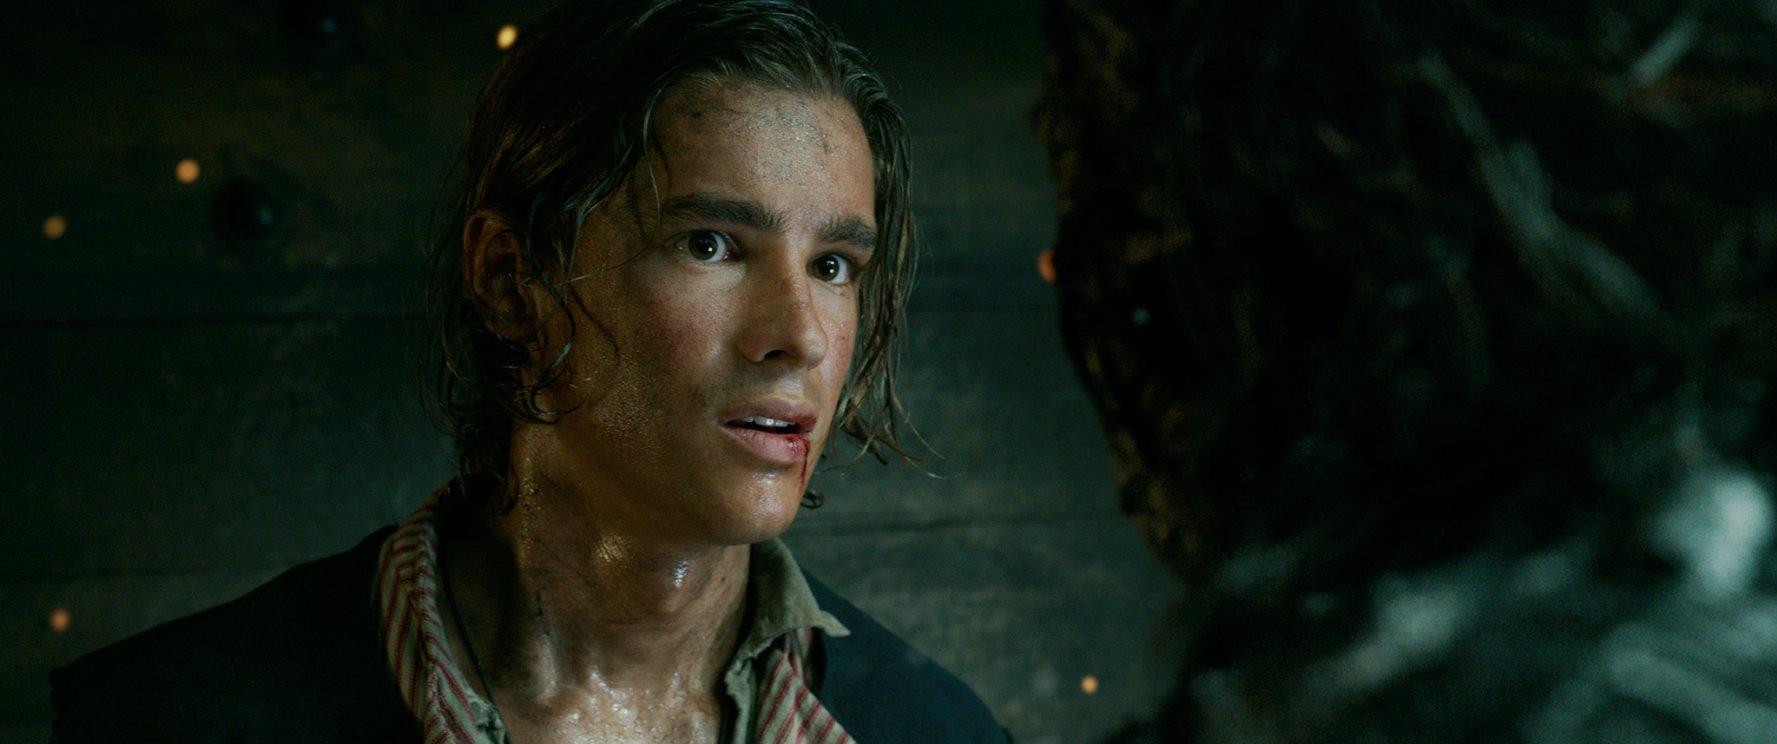 (4) film-piratite-od-karibite-odmazdata-na-salazar-pirates-of-the-caribbean-dead-men-tell-no-tales-www.kafepauza.mk